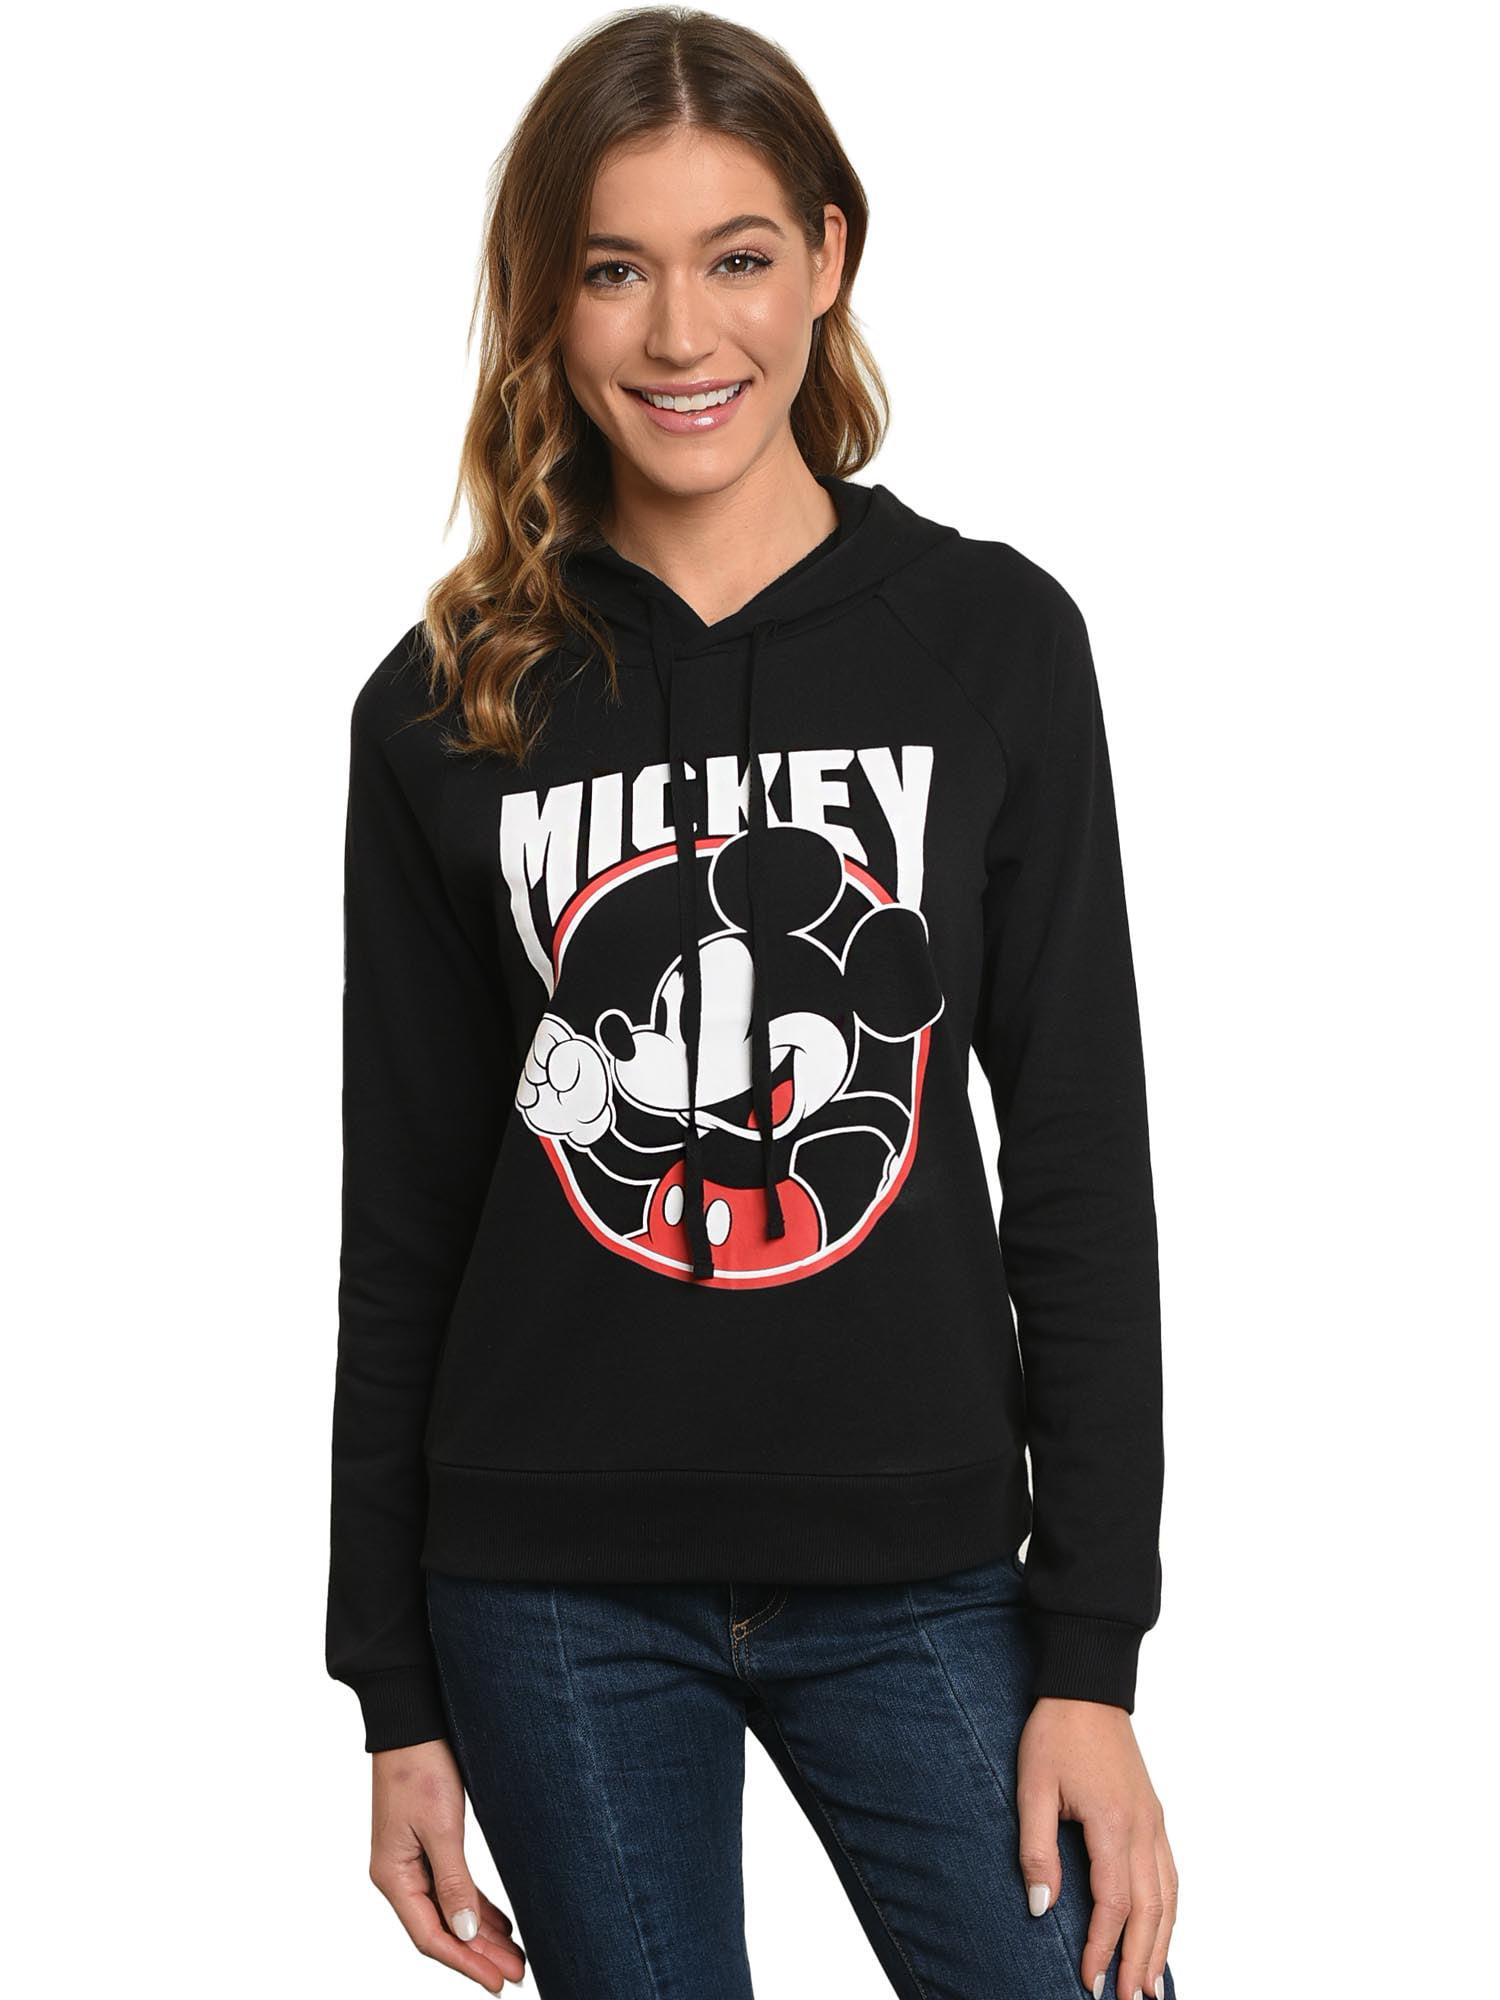 Juniors Mickey Mouse 28 Hoodie Sweatshirt - Black Front & Back